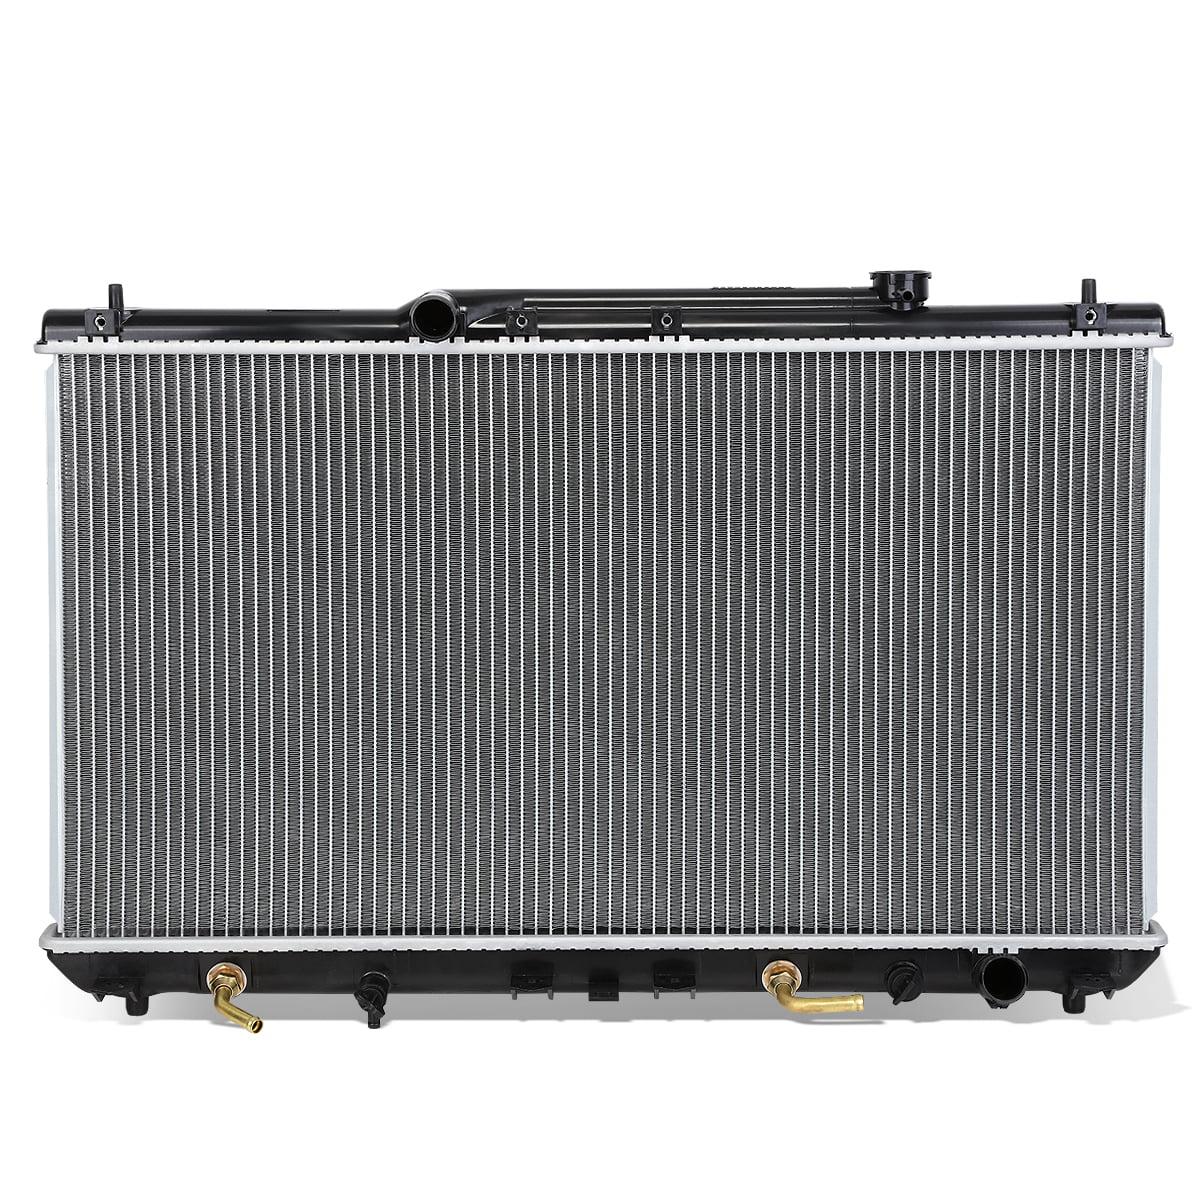 For 1997-2001 Camry/Solara 2.2L AT Performance OE Style Full Aluminum Core Radiator 1909